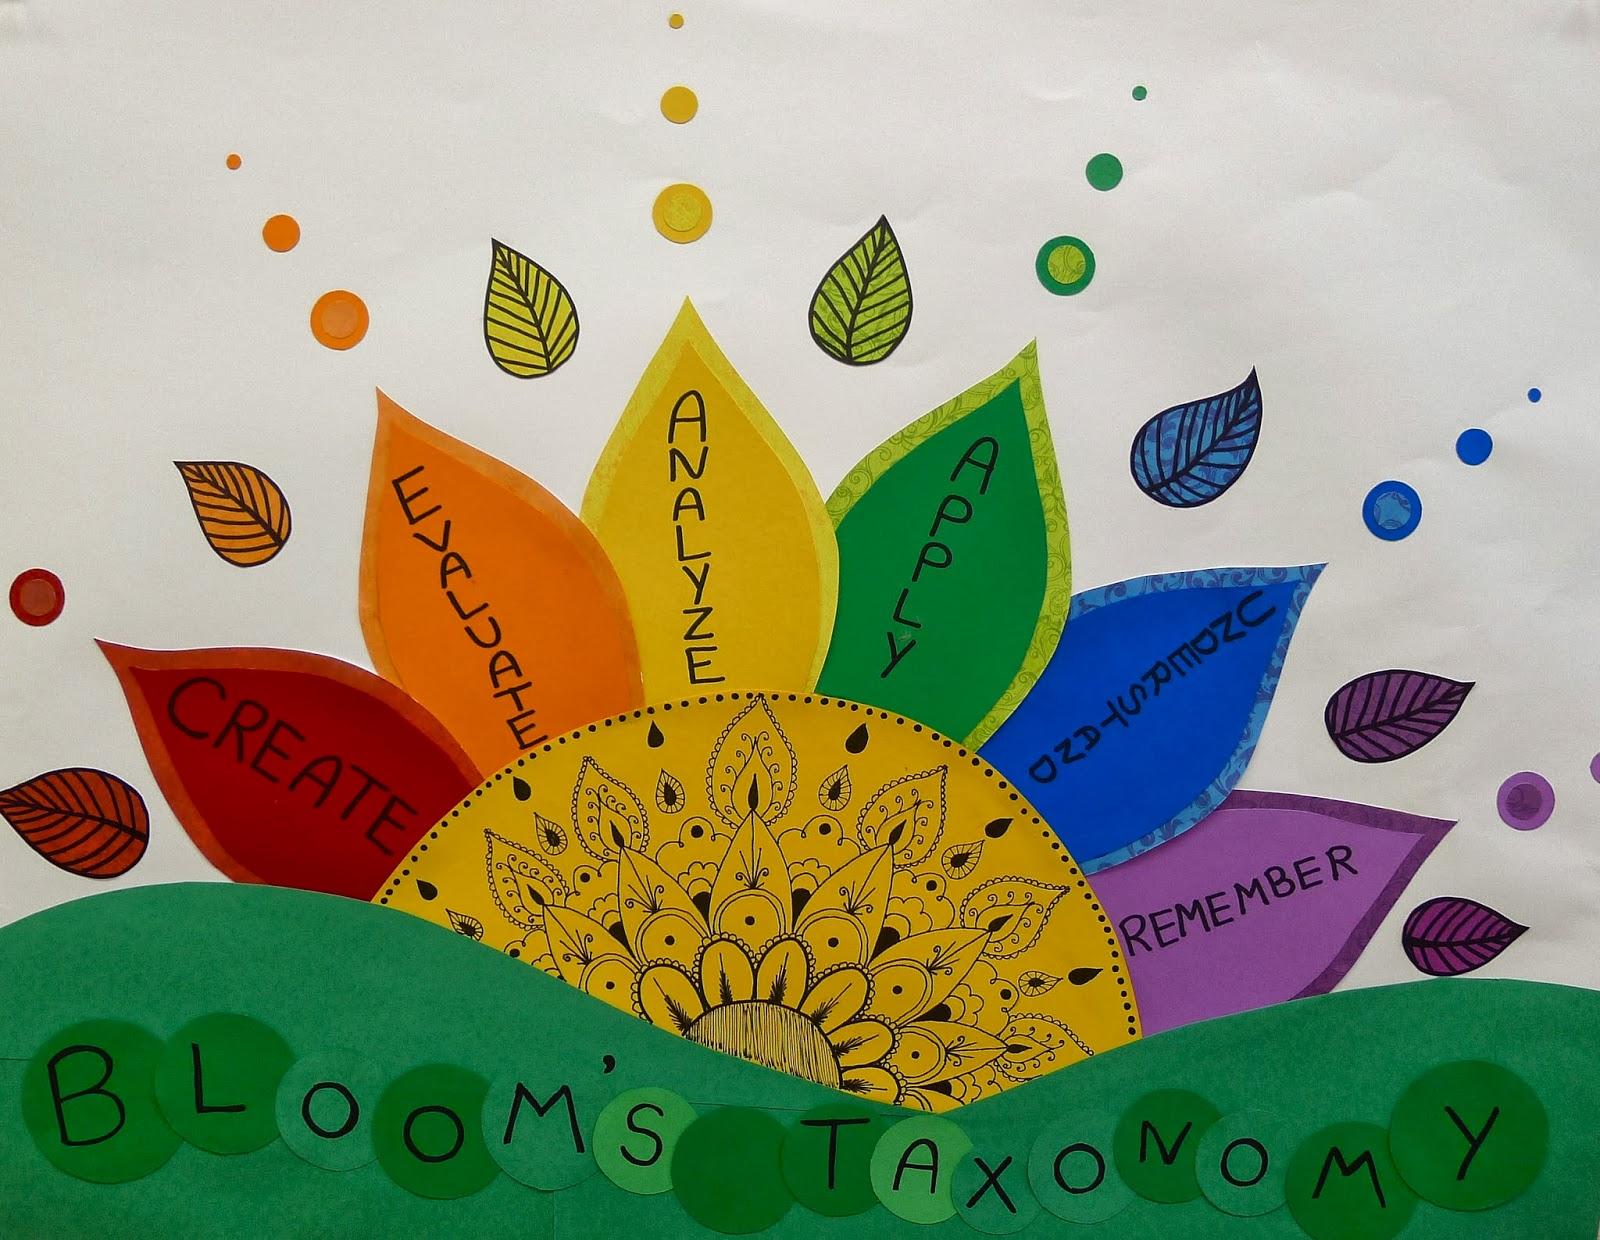 benjamin bloom taxonomy of educational objectives 1956 pdf